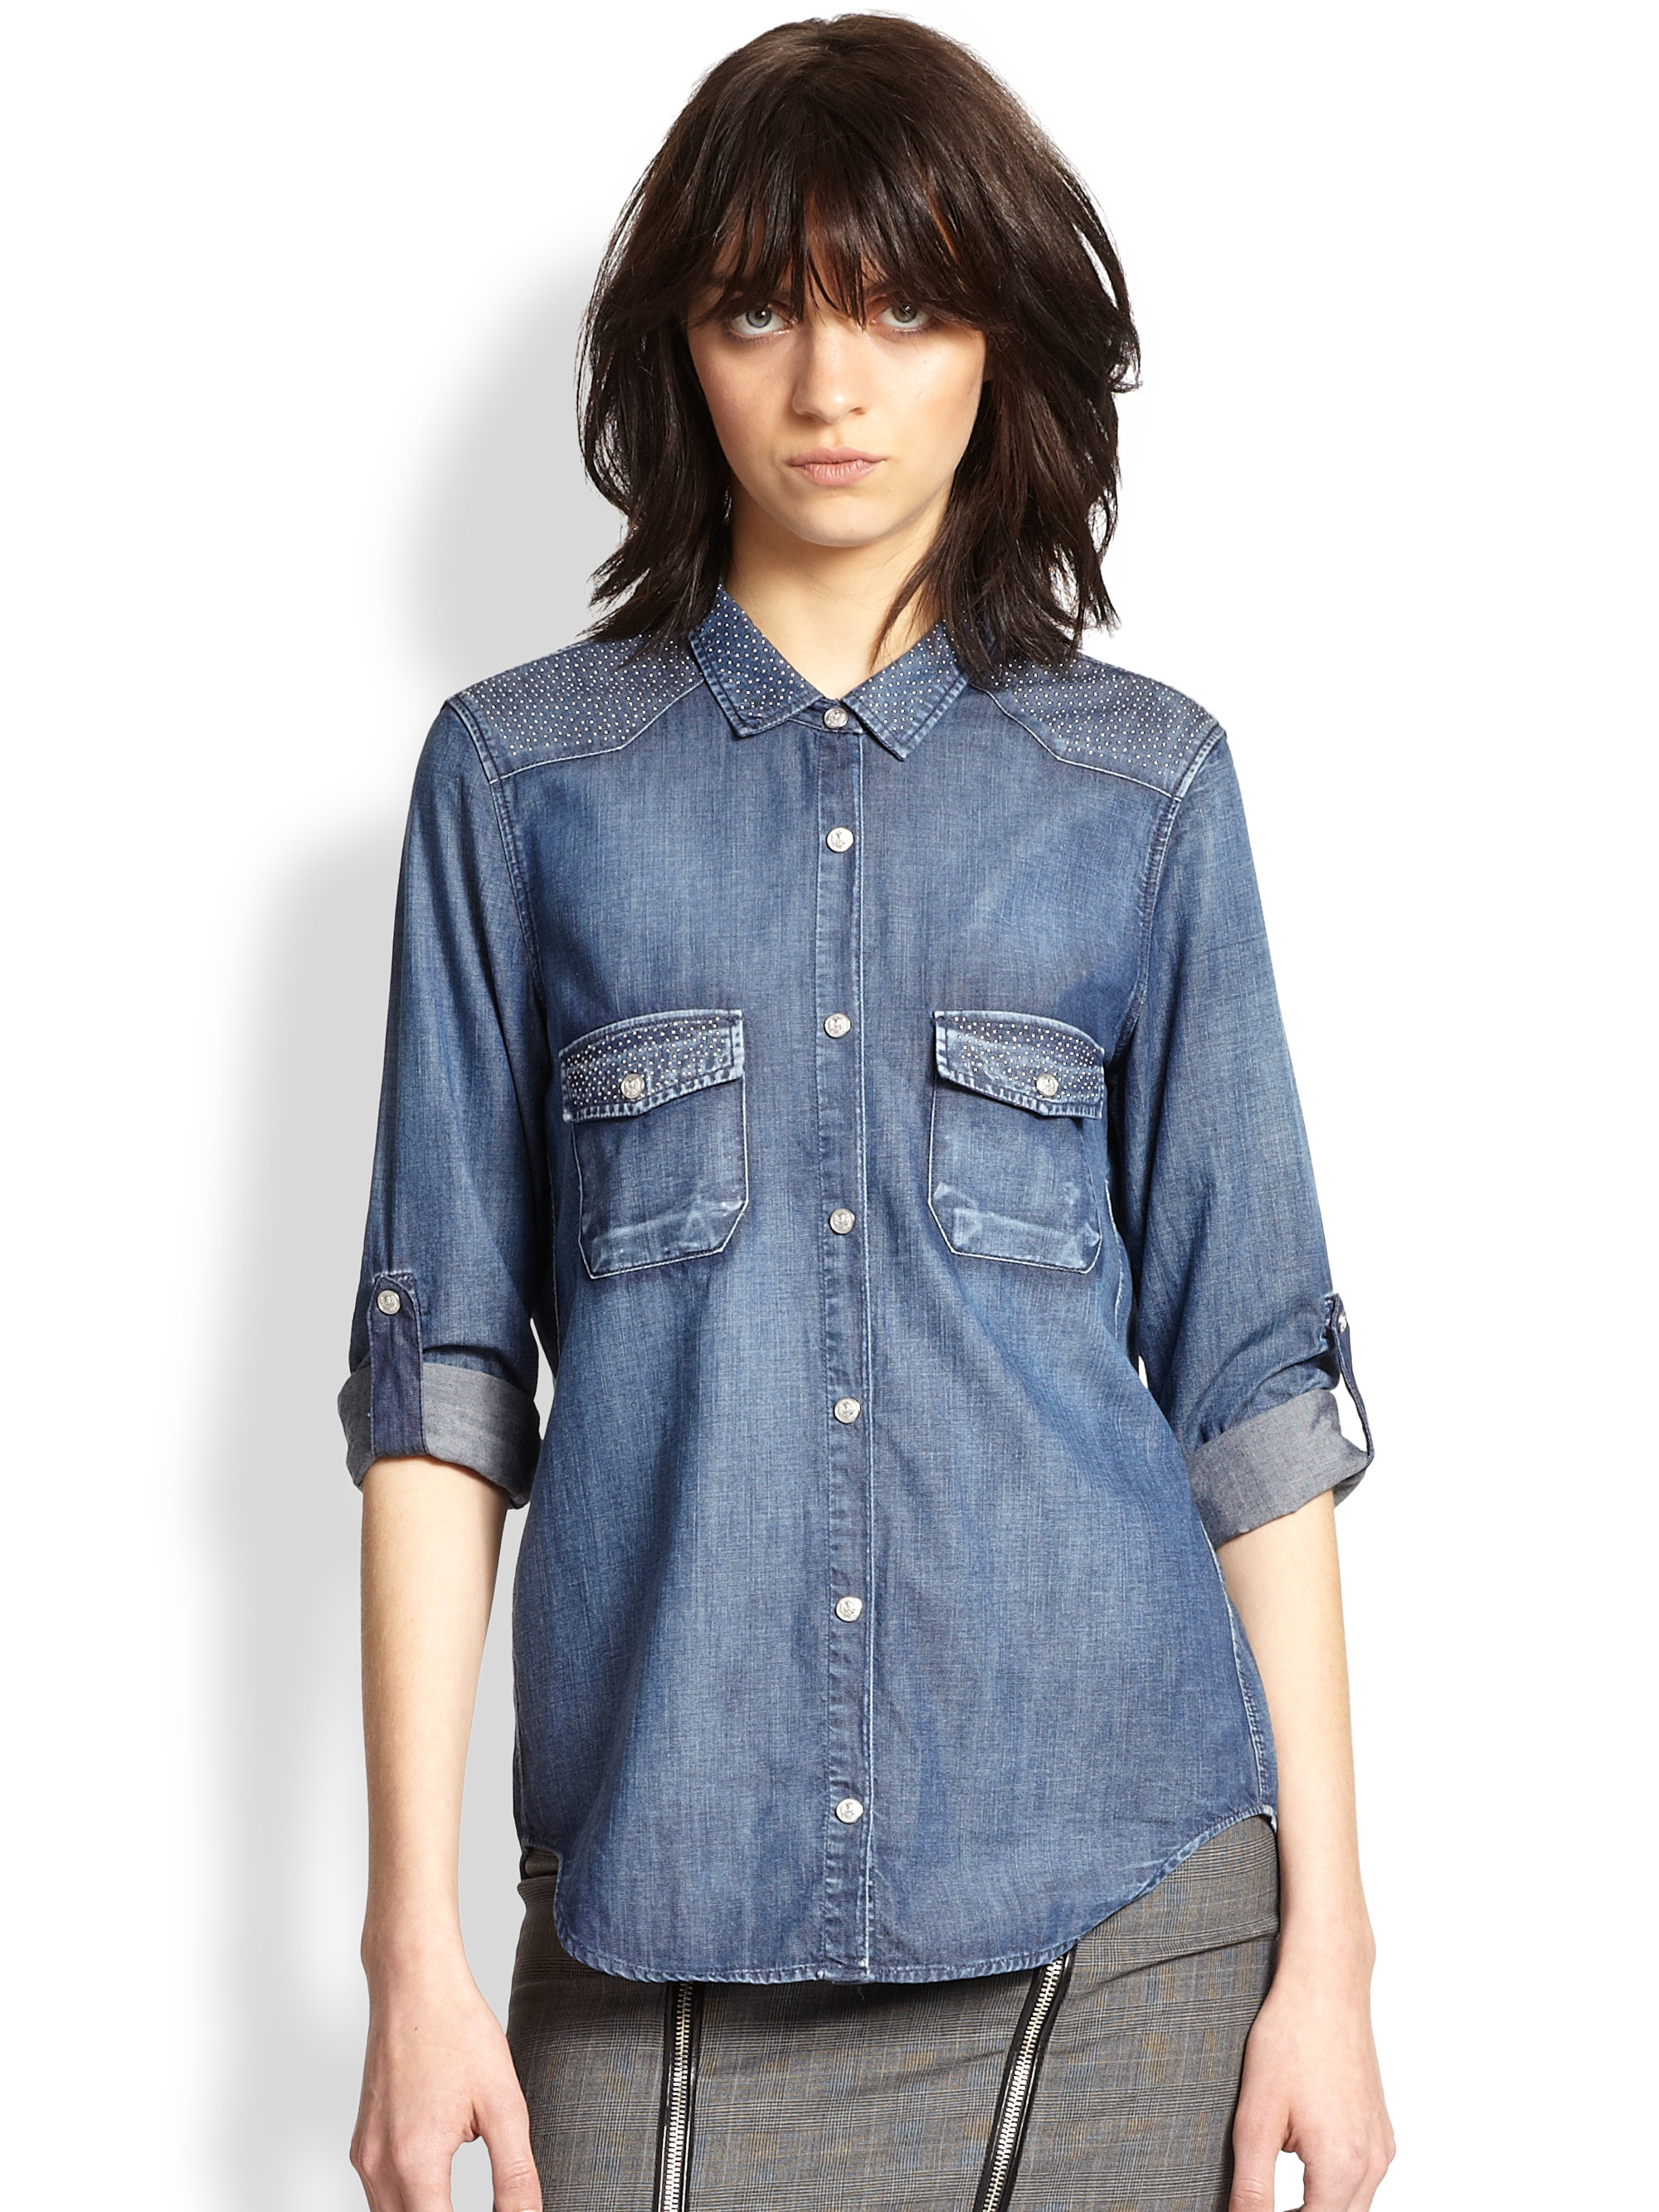 1de49285833 The Kooples Studded Denim Shirt in Blue - Lyst